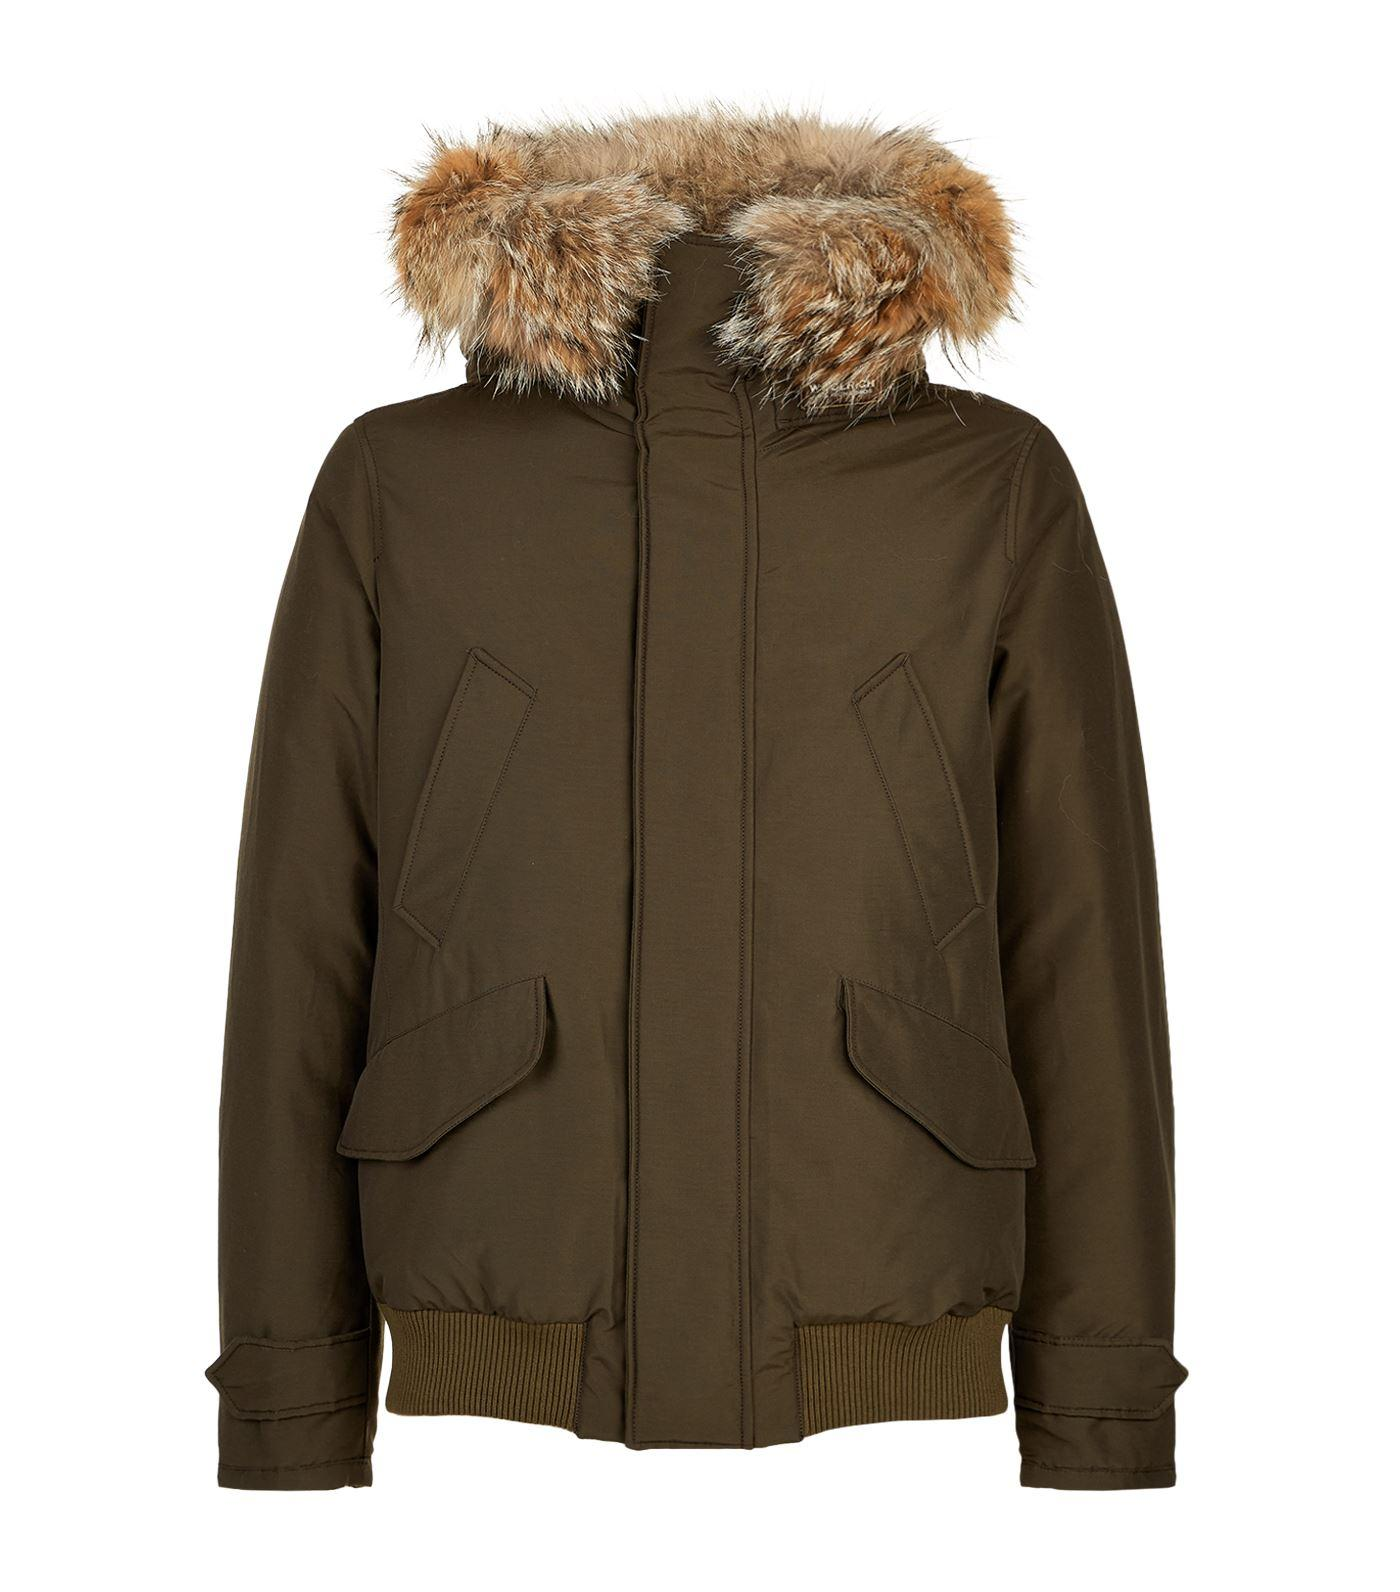 Woolrich Polar Jacket In Grey